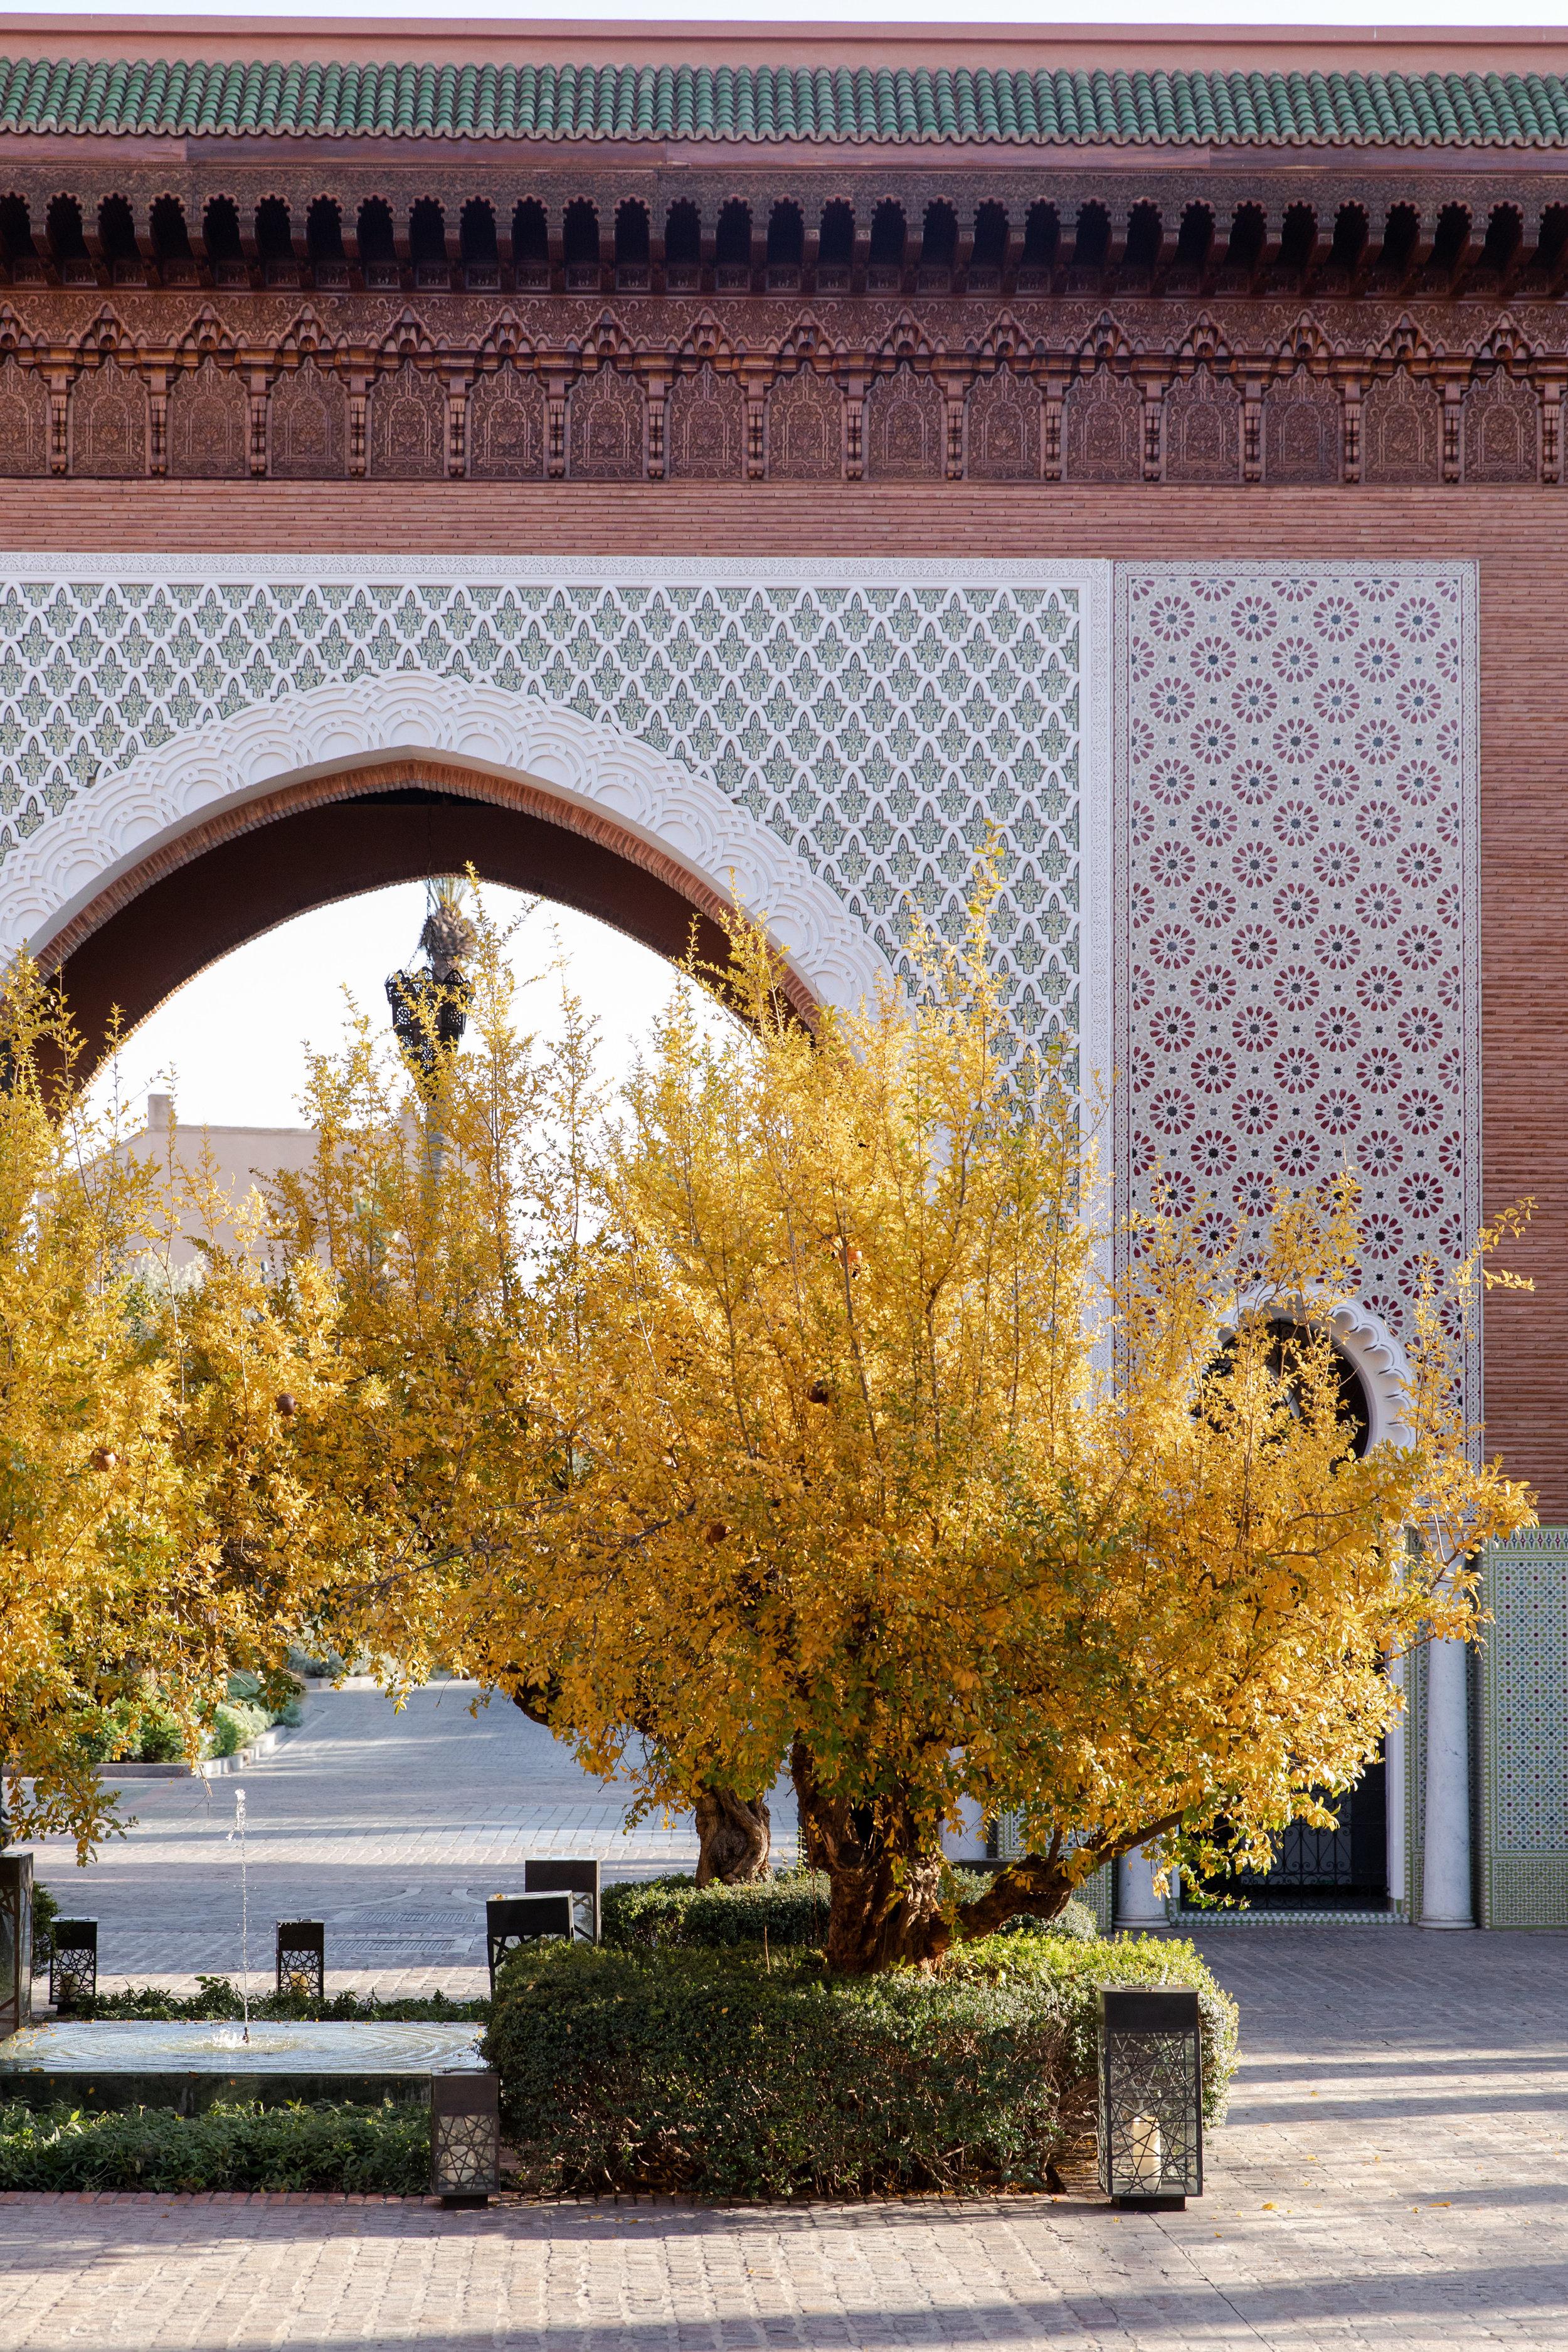 Morocco-3107.jpg